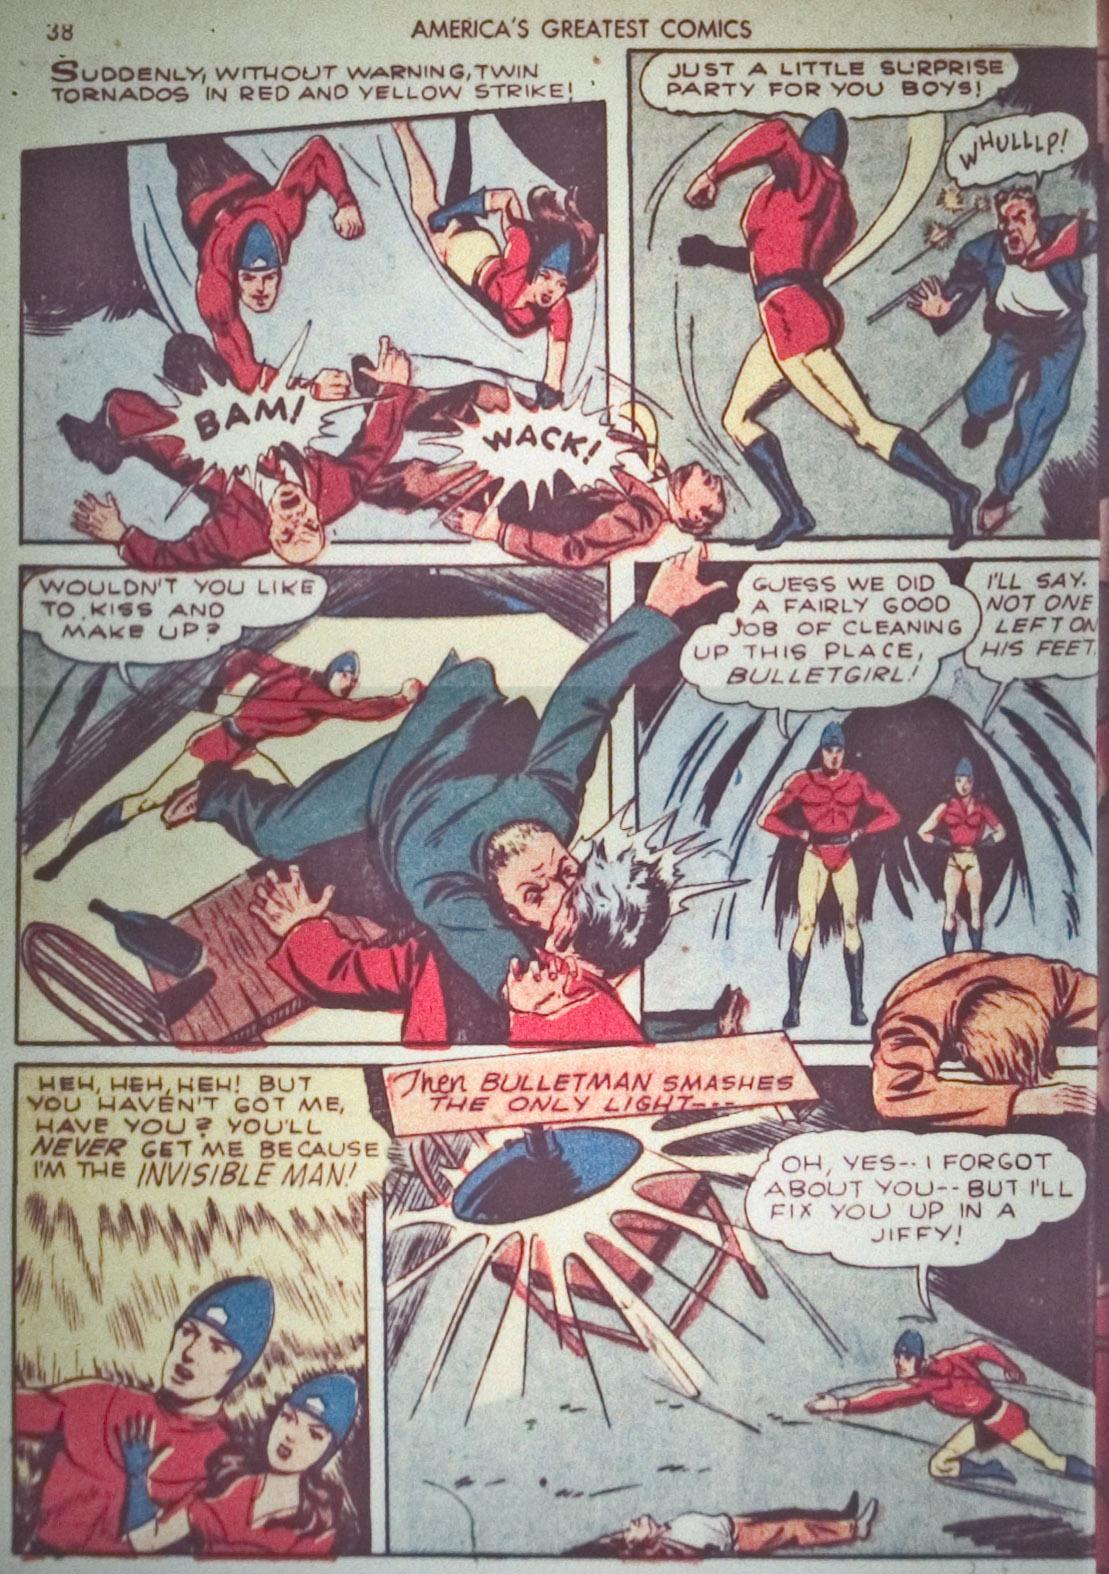 Read online America's Greatest Comics comic -  Issue #1 - 41